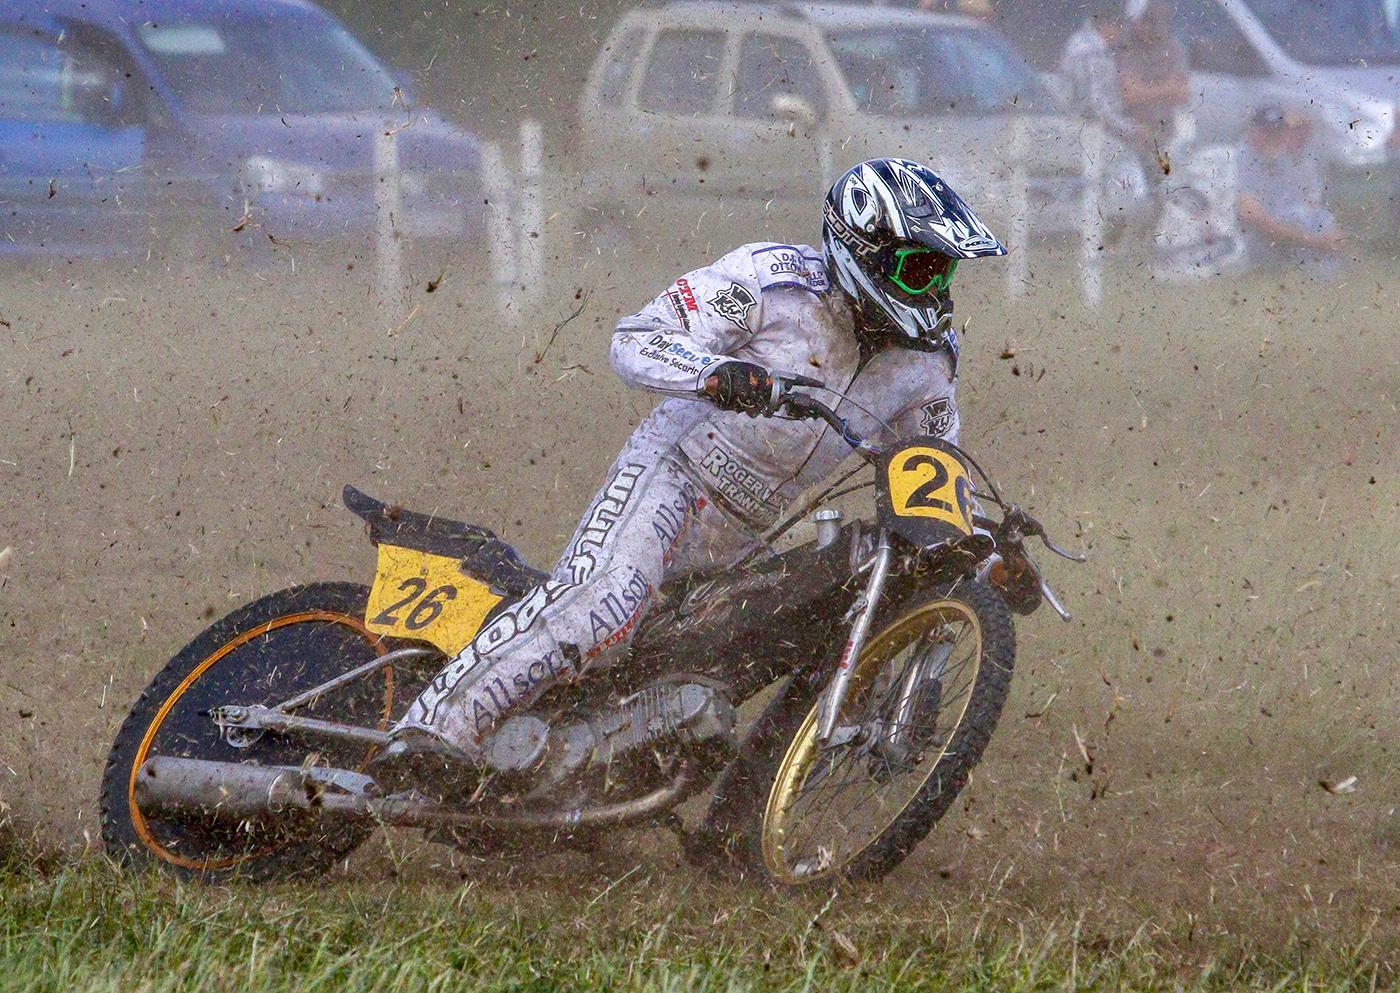 Grass Track Rider